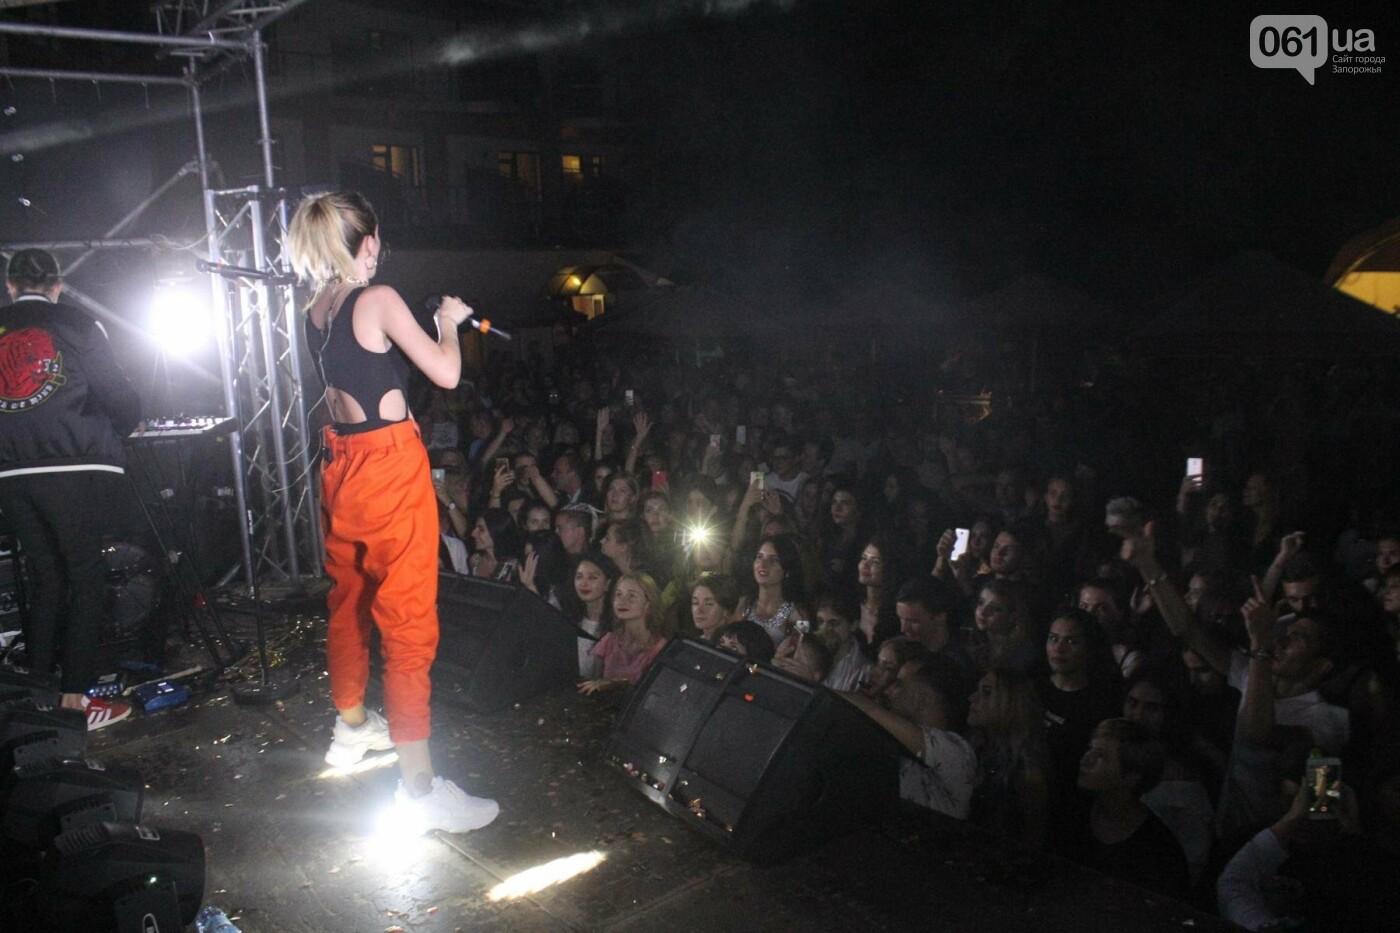 ALEKSEEV, «Агонь» и MamaRika: в Запорожье звезды устроили яркий концерт на «Miss AVRORA Summer 2018», – ФОТОРЕПОРТАЖ, фото-5